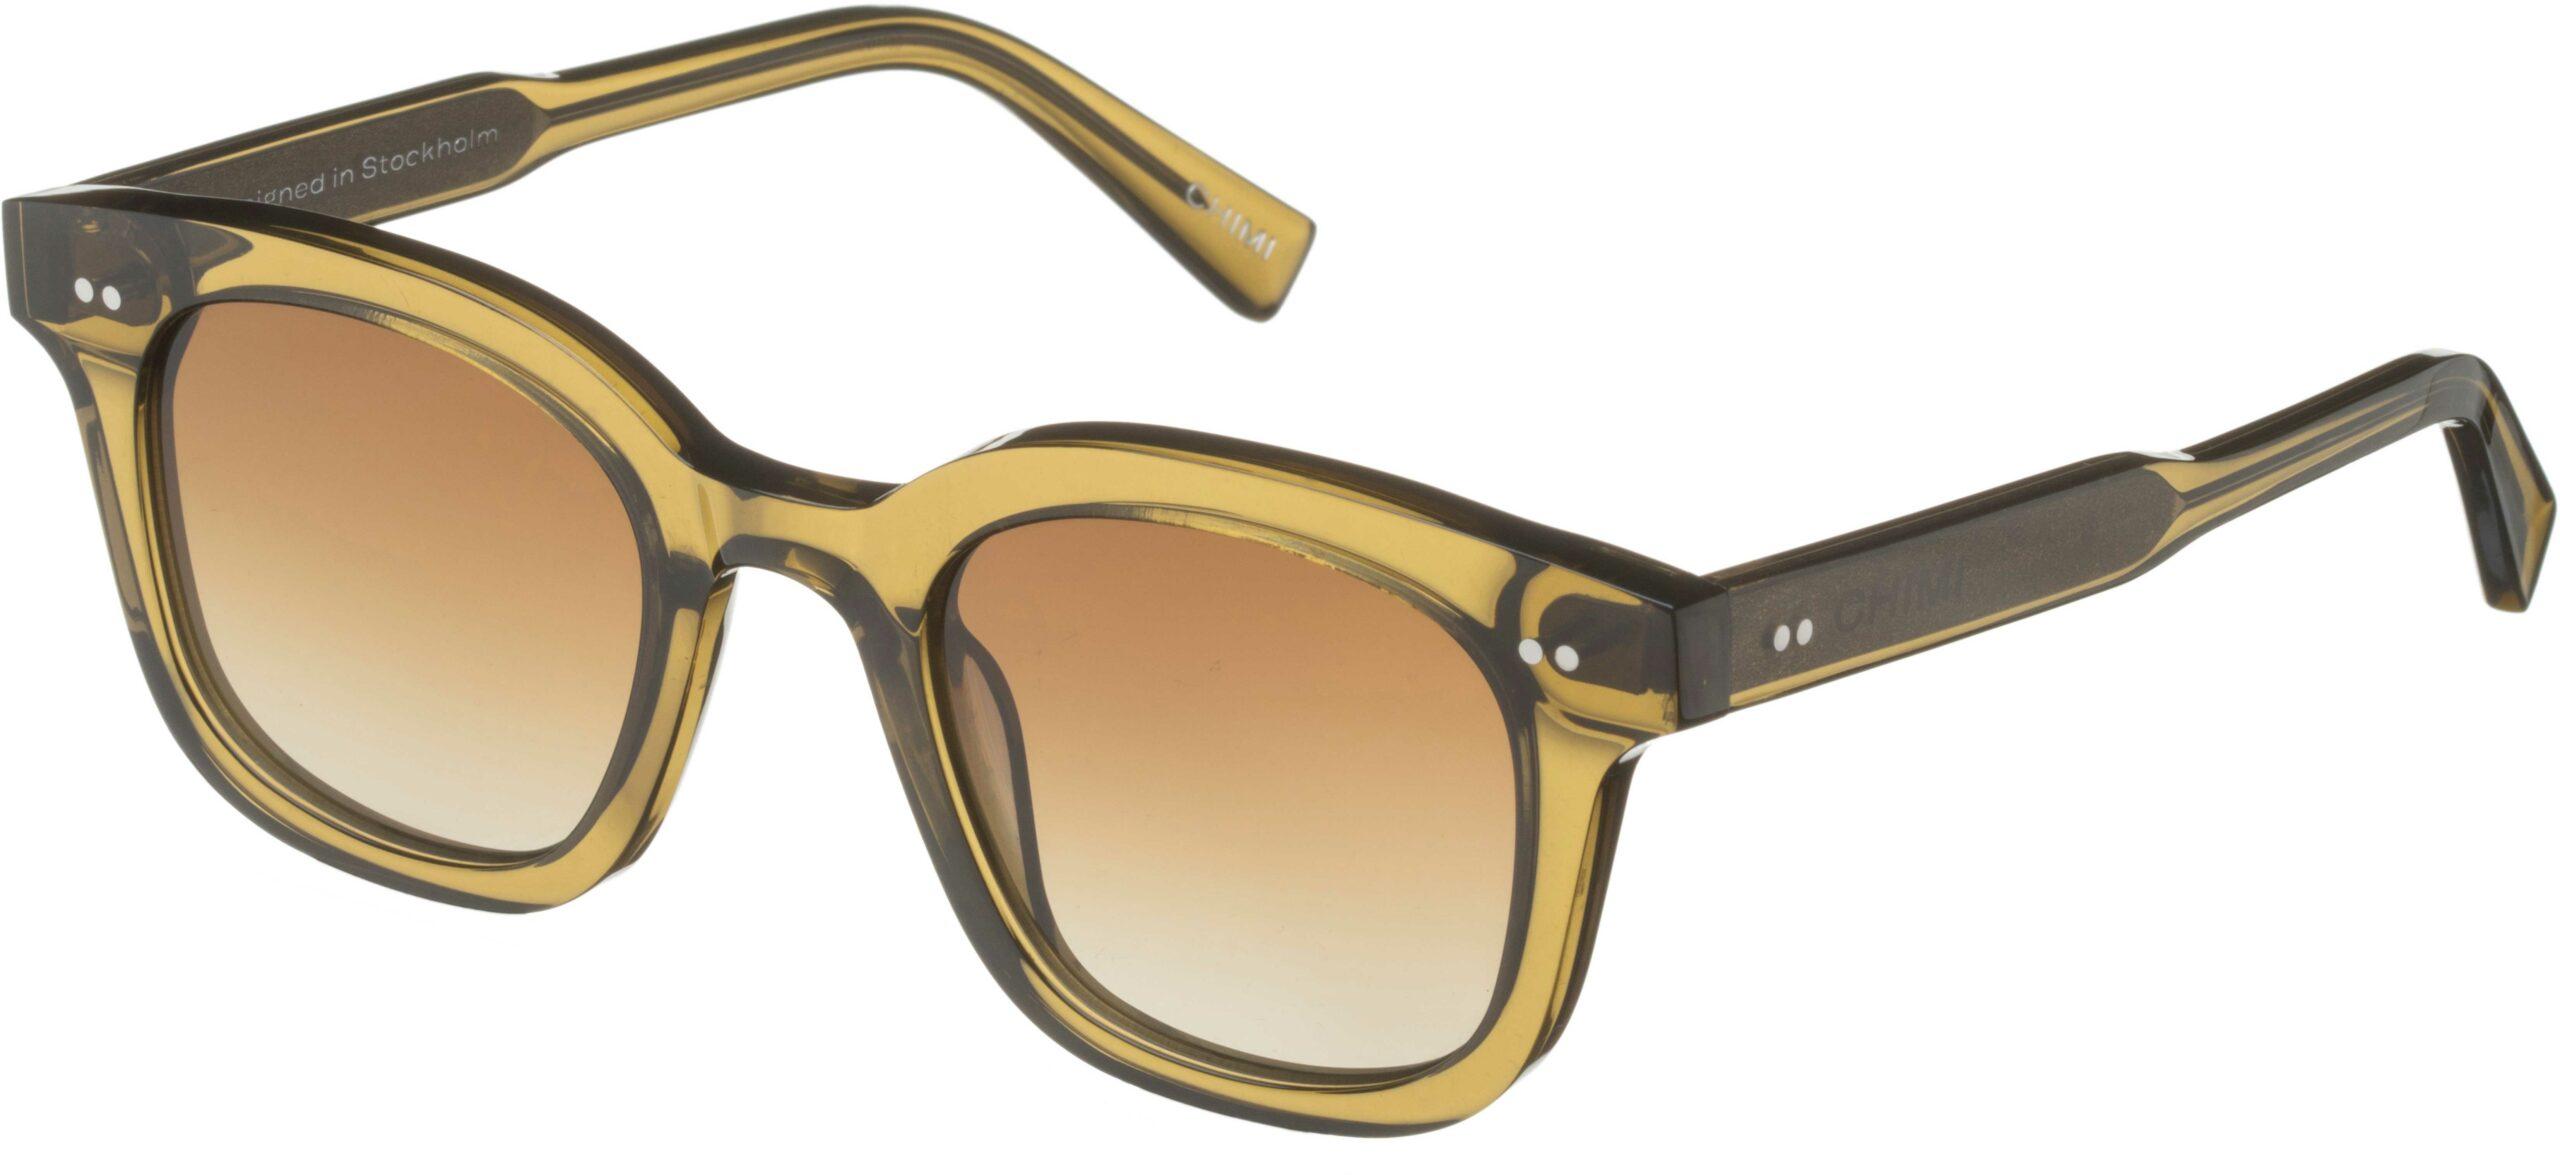 Chimi Eyewear #02 Green/Gradient Brown | 7340192604352